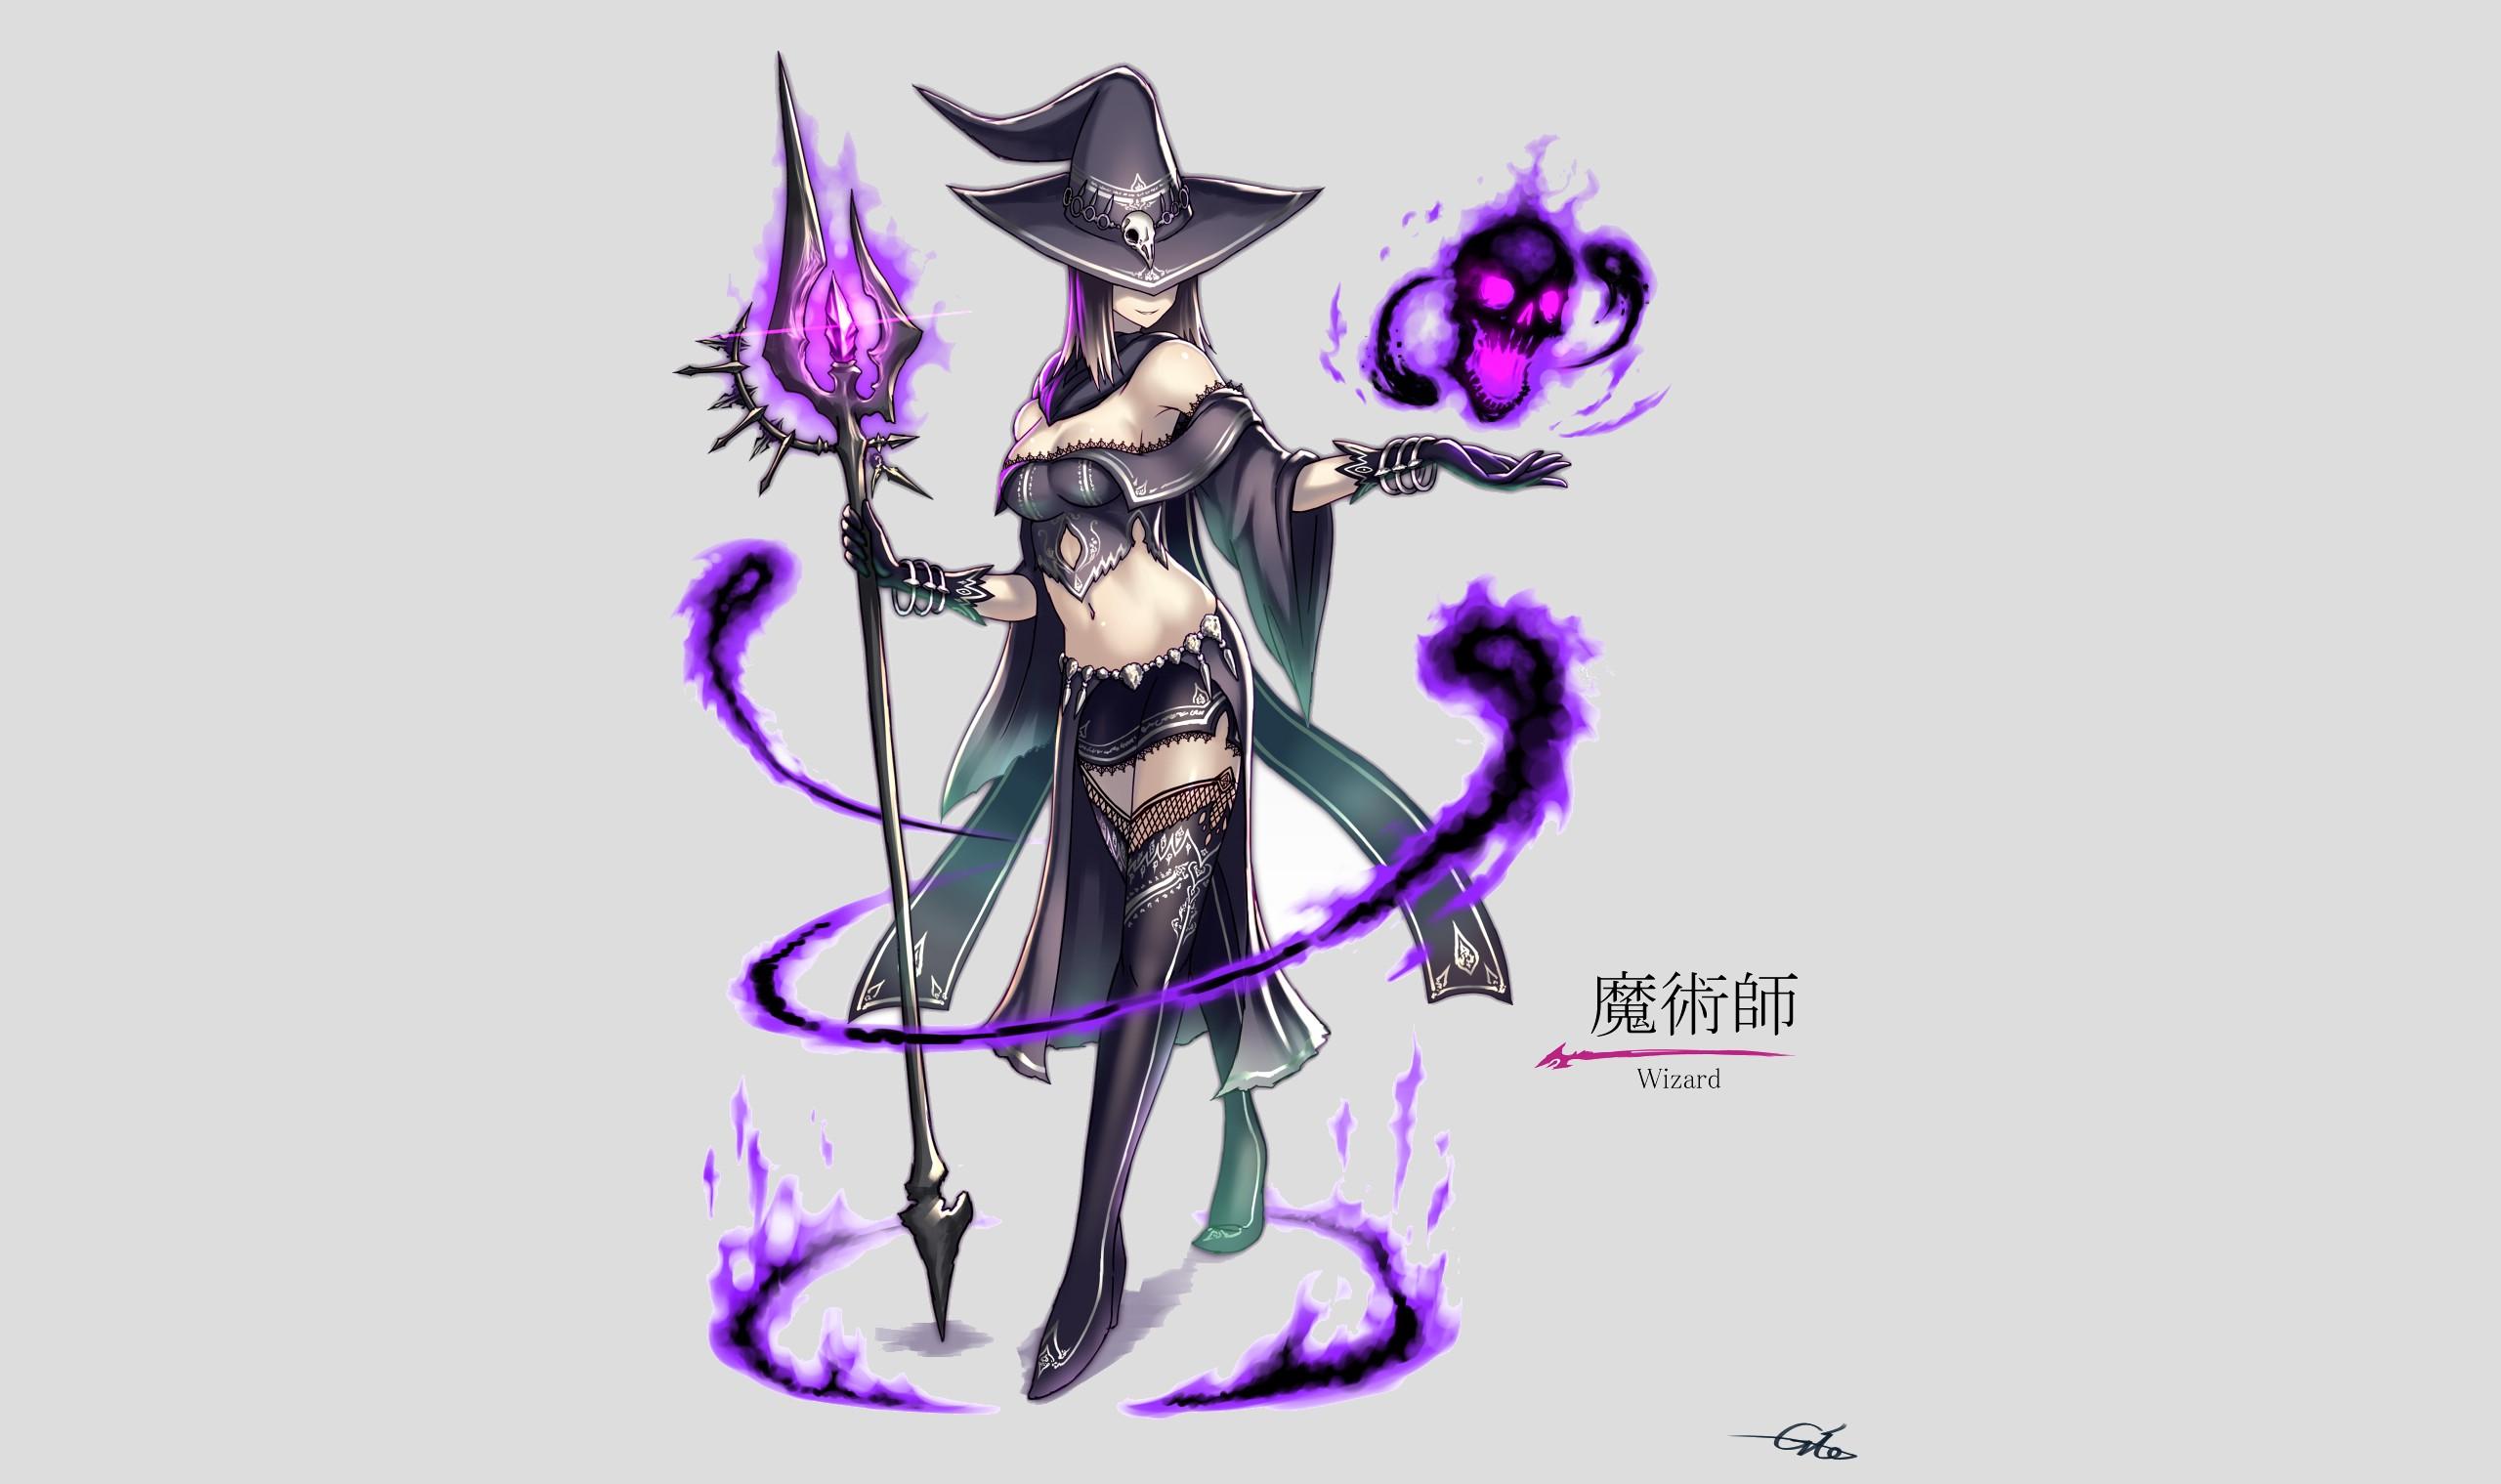 2560x1519 Wallpaper Drawing, Illustration, Anime Girls, Hat, Weapon